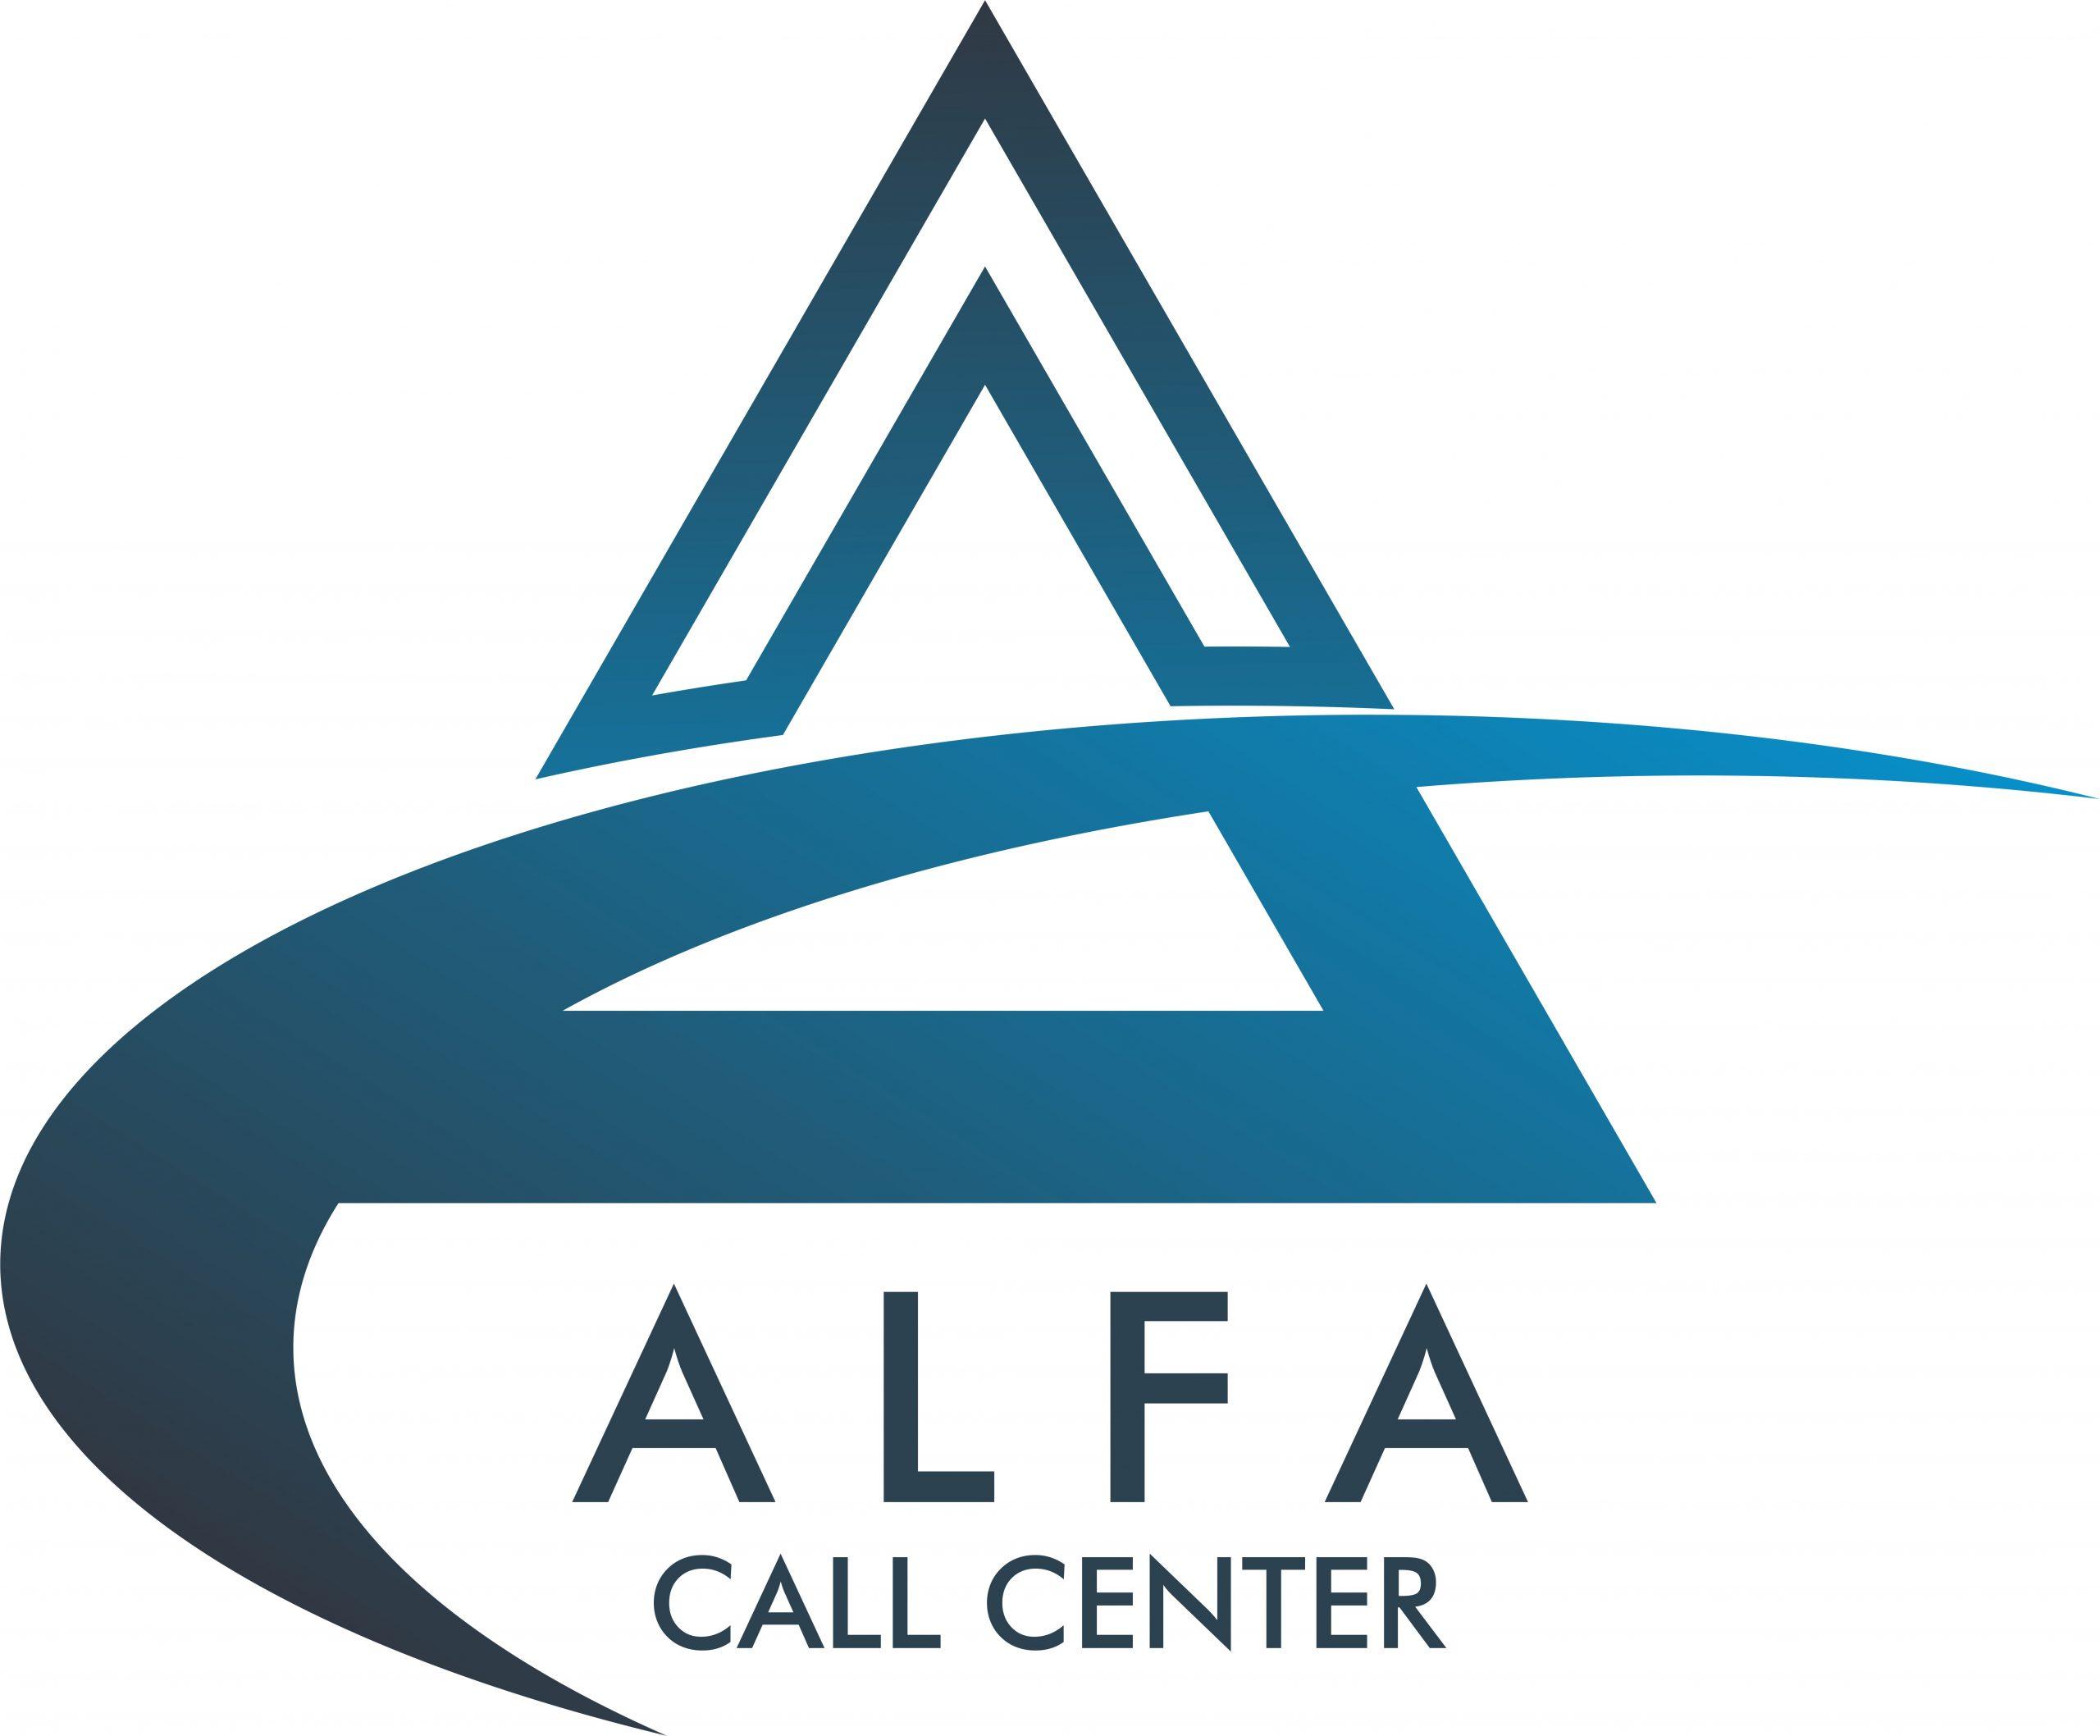 ALFA CALL CENTER